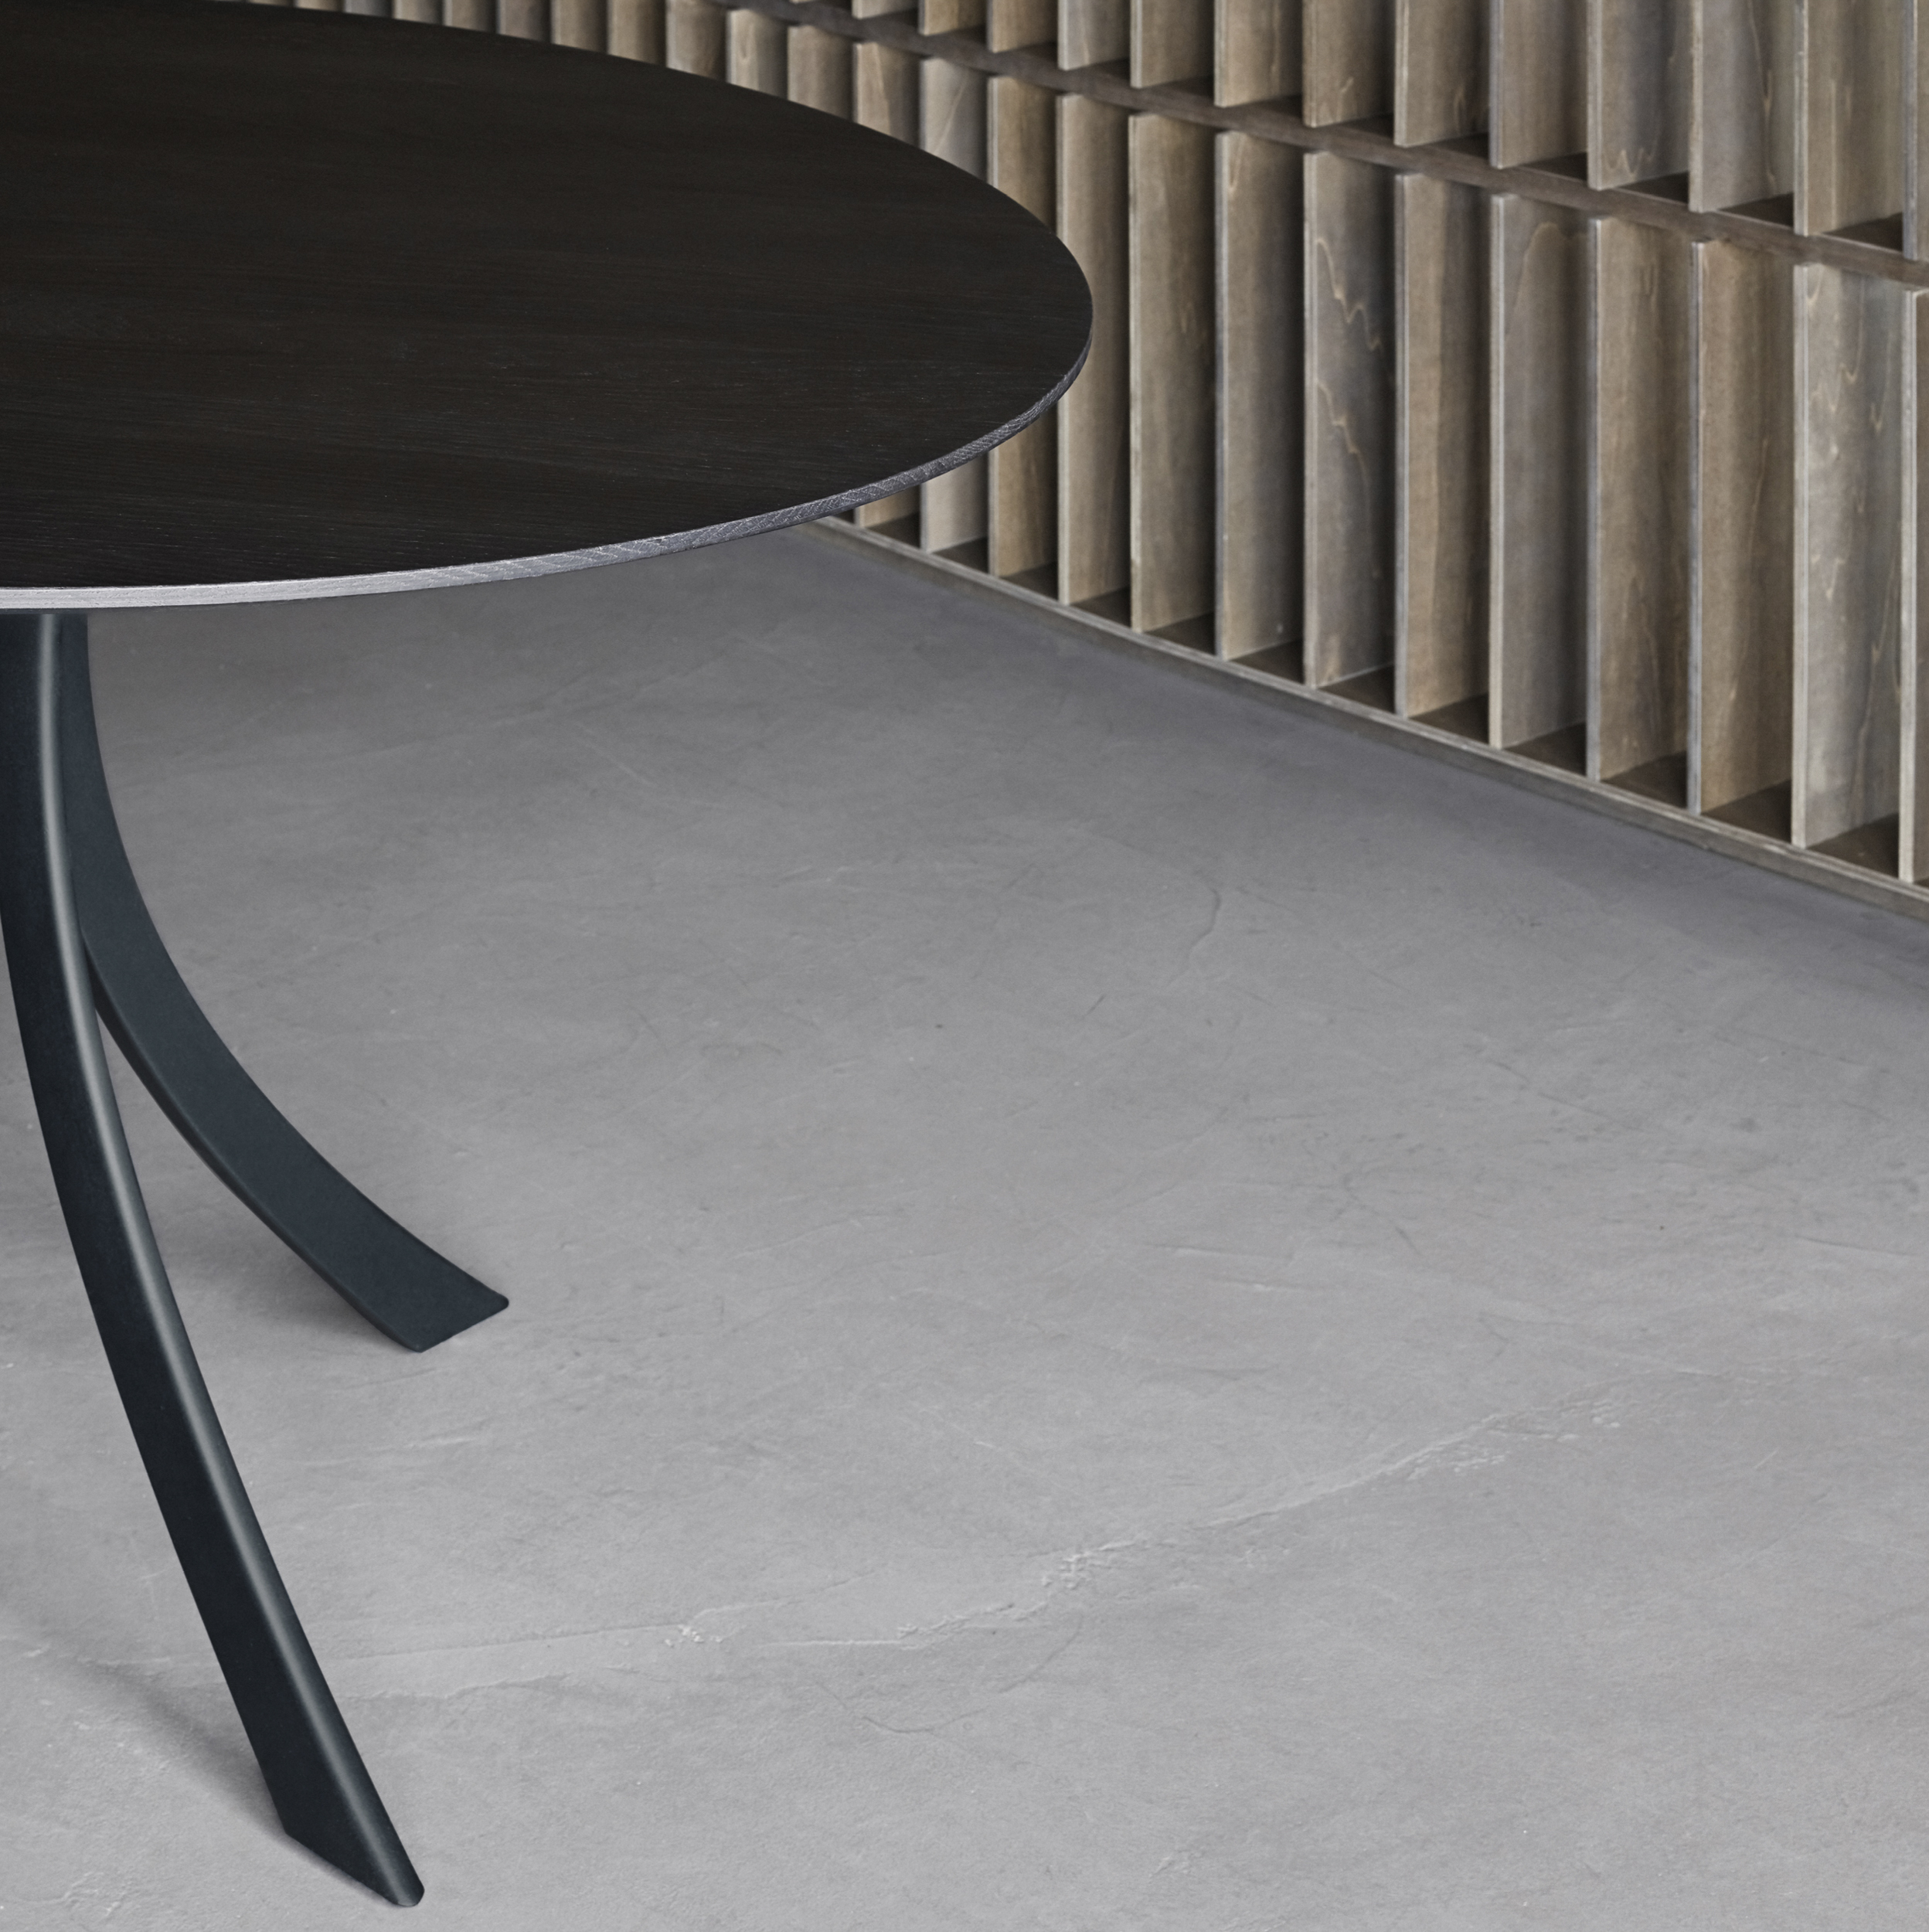 expormim-furniture-falcata-indoor-round-dining-table